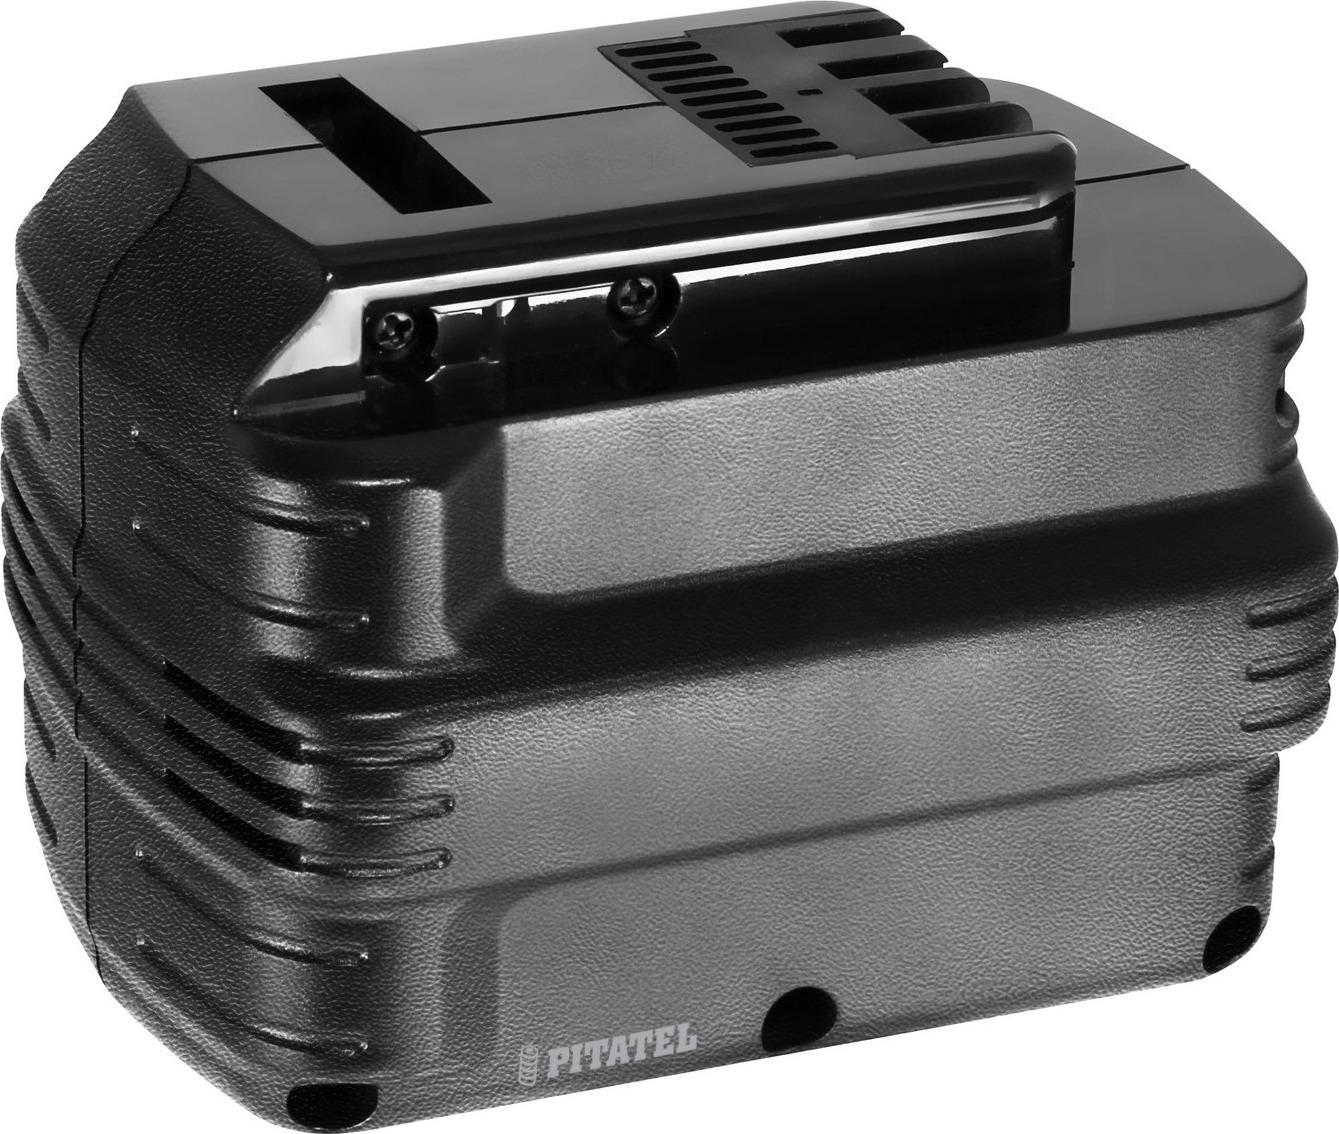 Аккумулятор для инструмента DEWALT Pitatel TSB-021-DE24-30M, черный аккумулятор для инструмента pitatel для panasonic tsb 182 pan24 30m